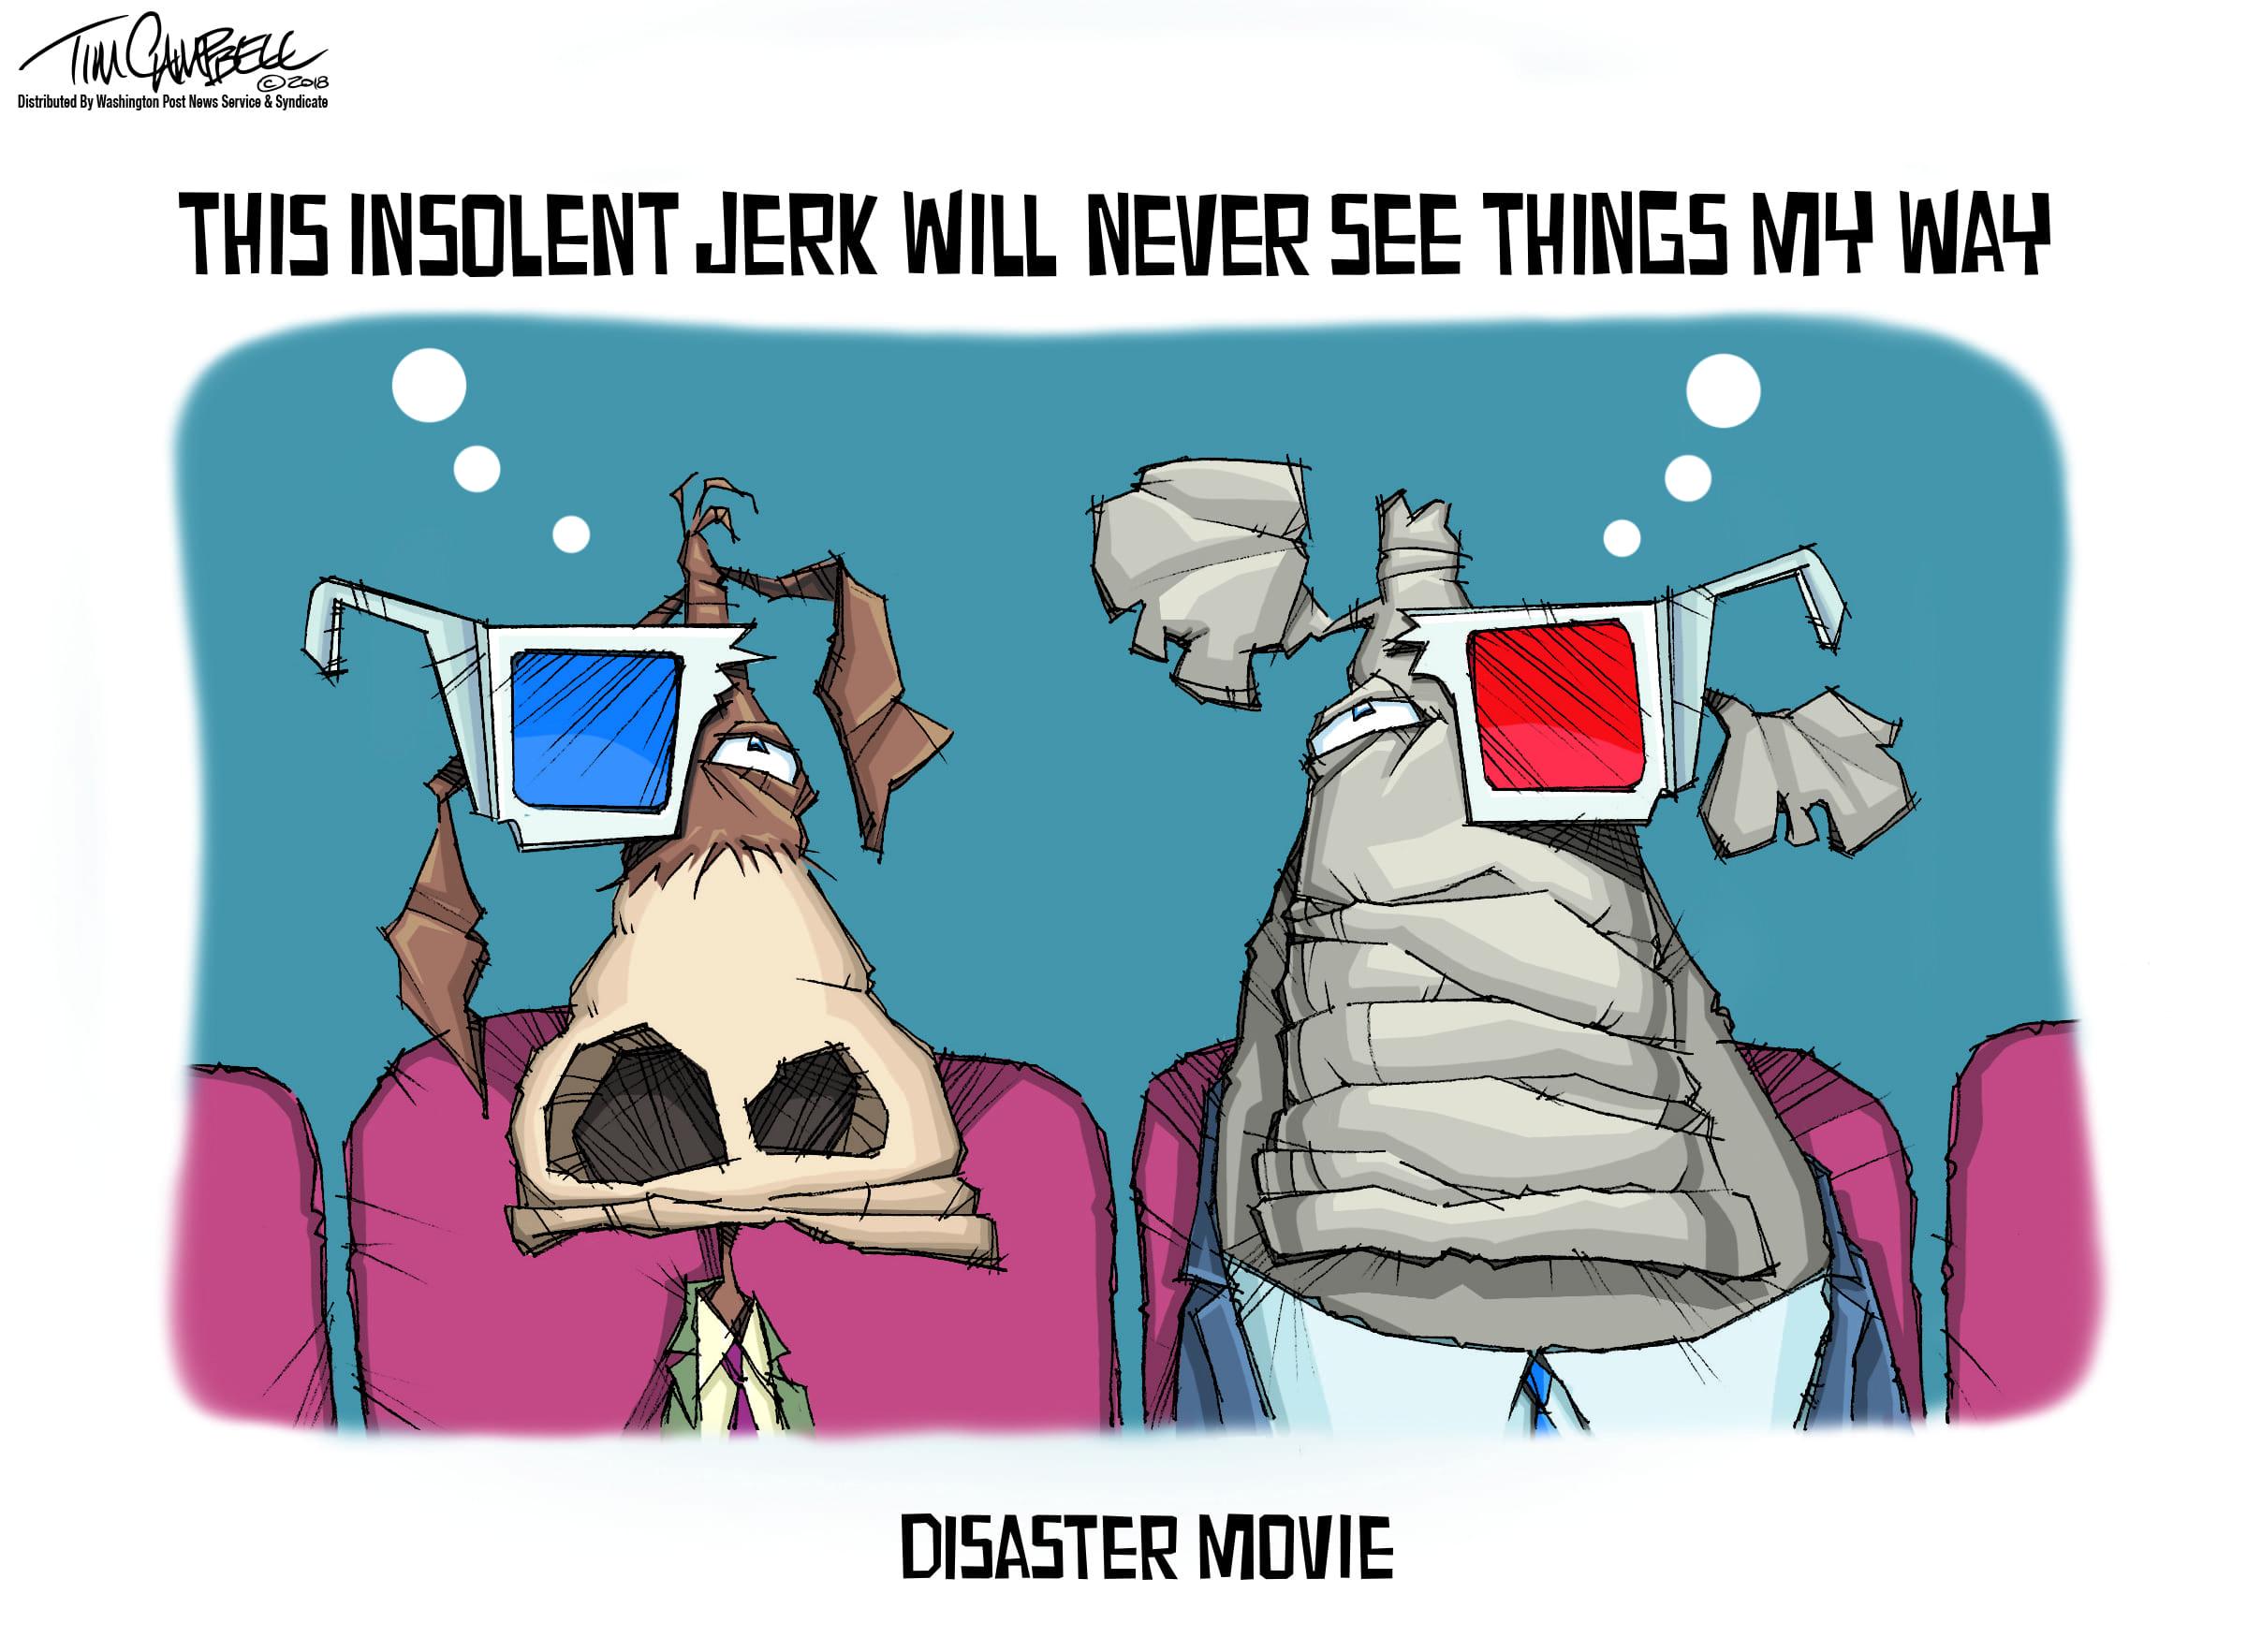 June 30: 3D Glasses